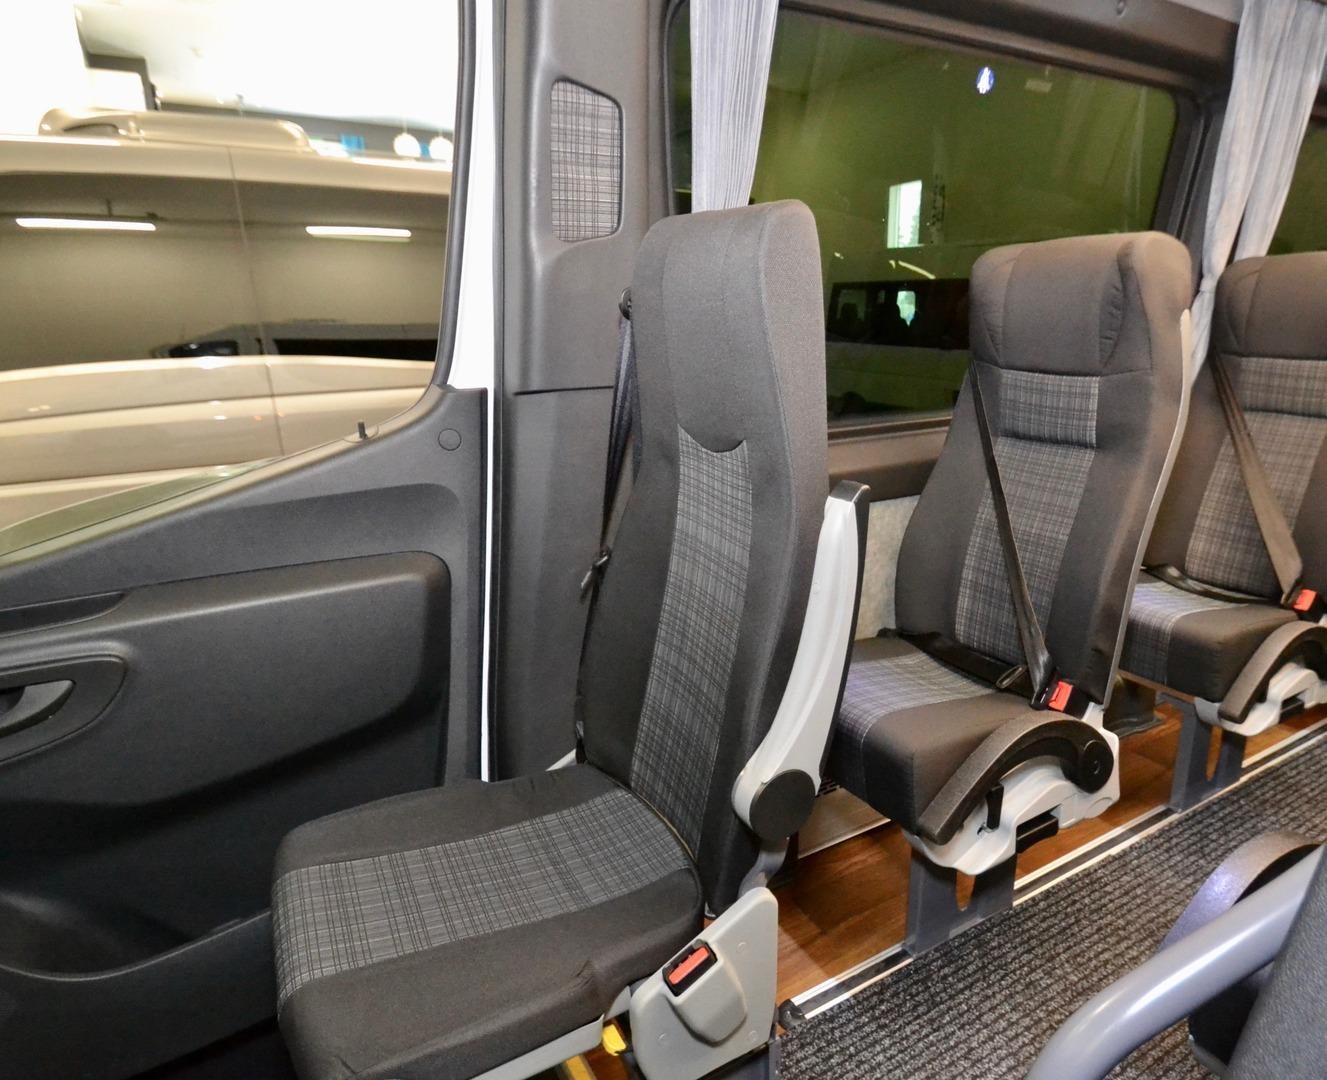 MERCEDES-BENZ Sprinter, 416 CDI Automet AW Edition